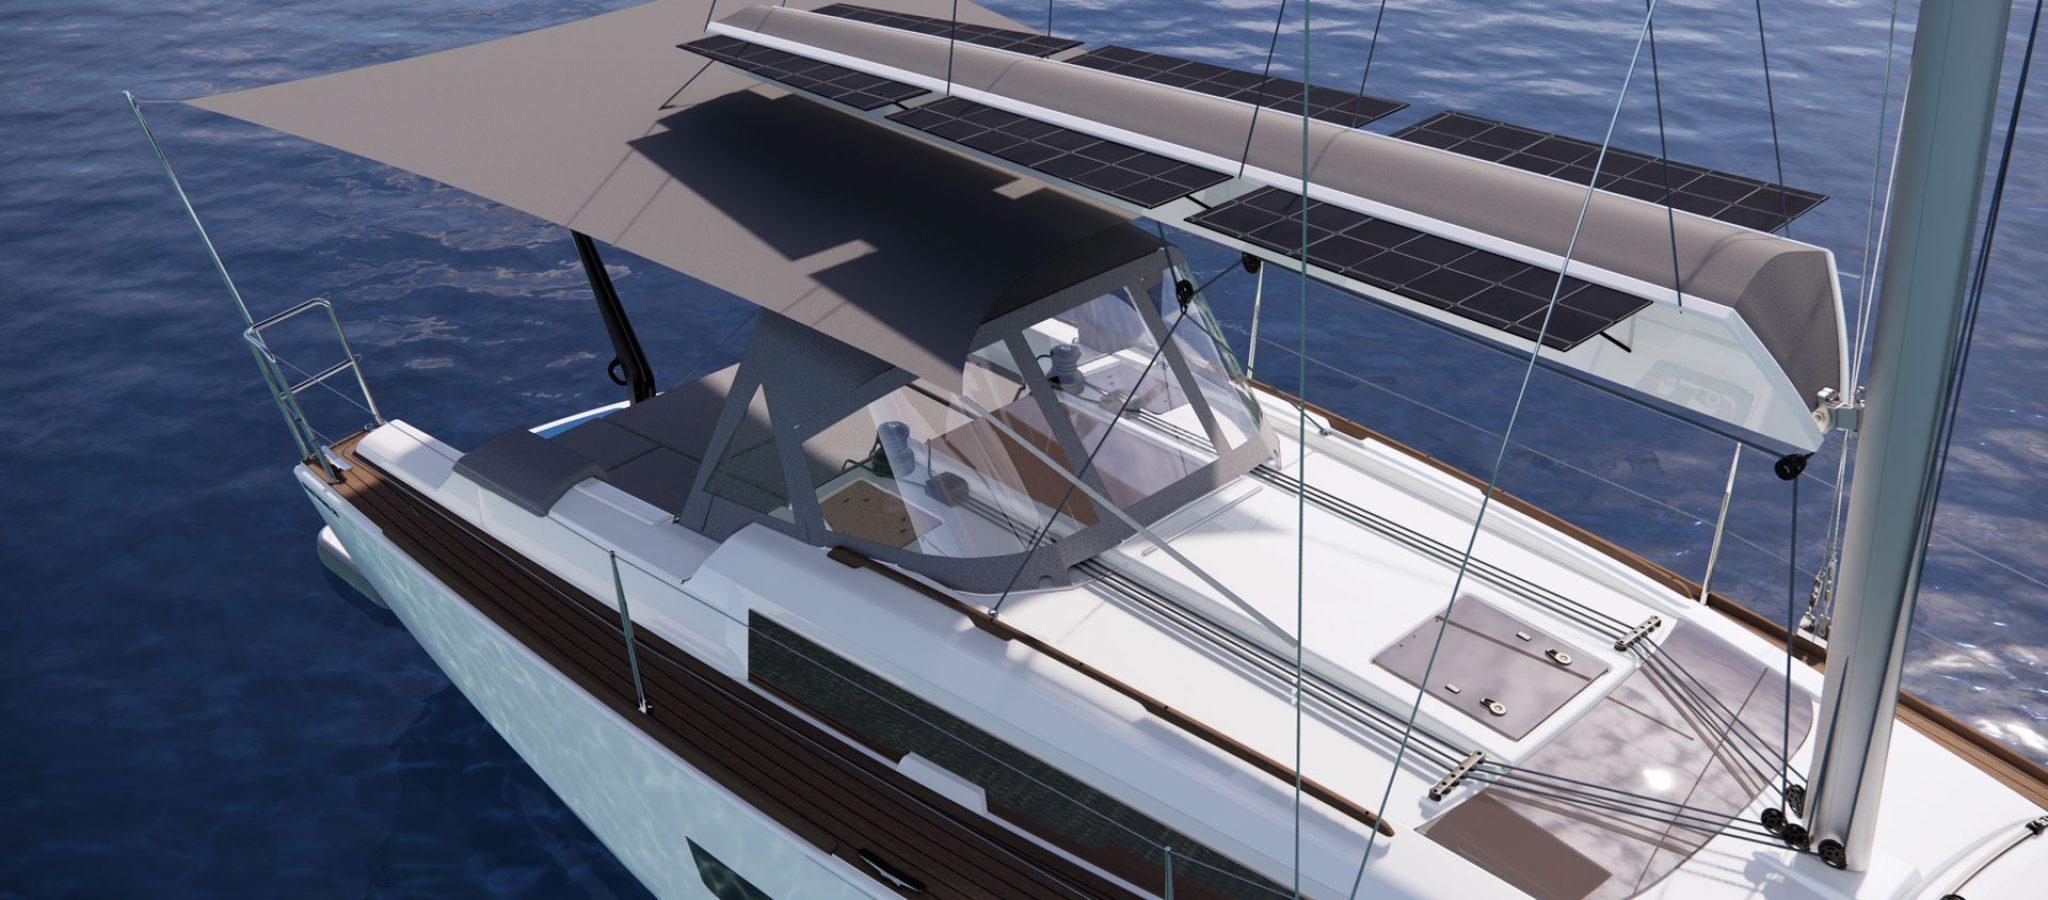 dufour-32-sailing-yacht-luxury-6